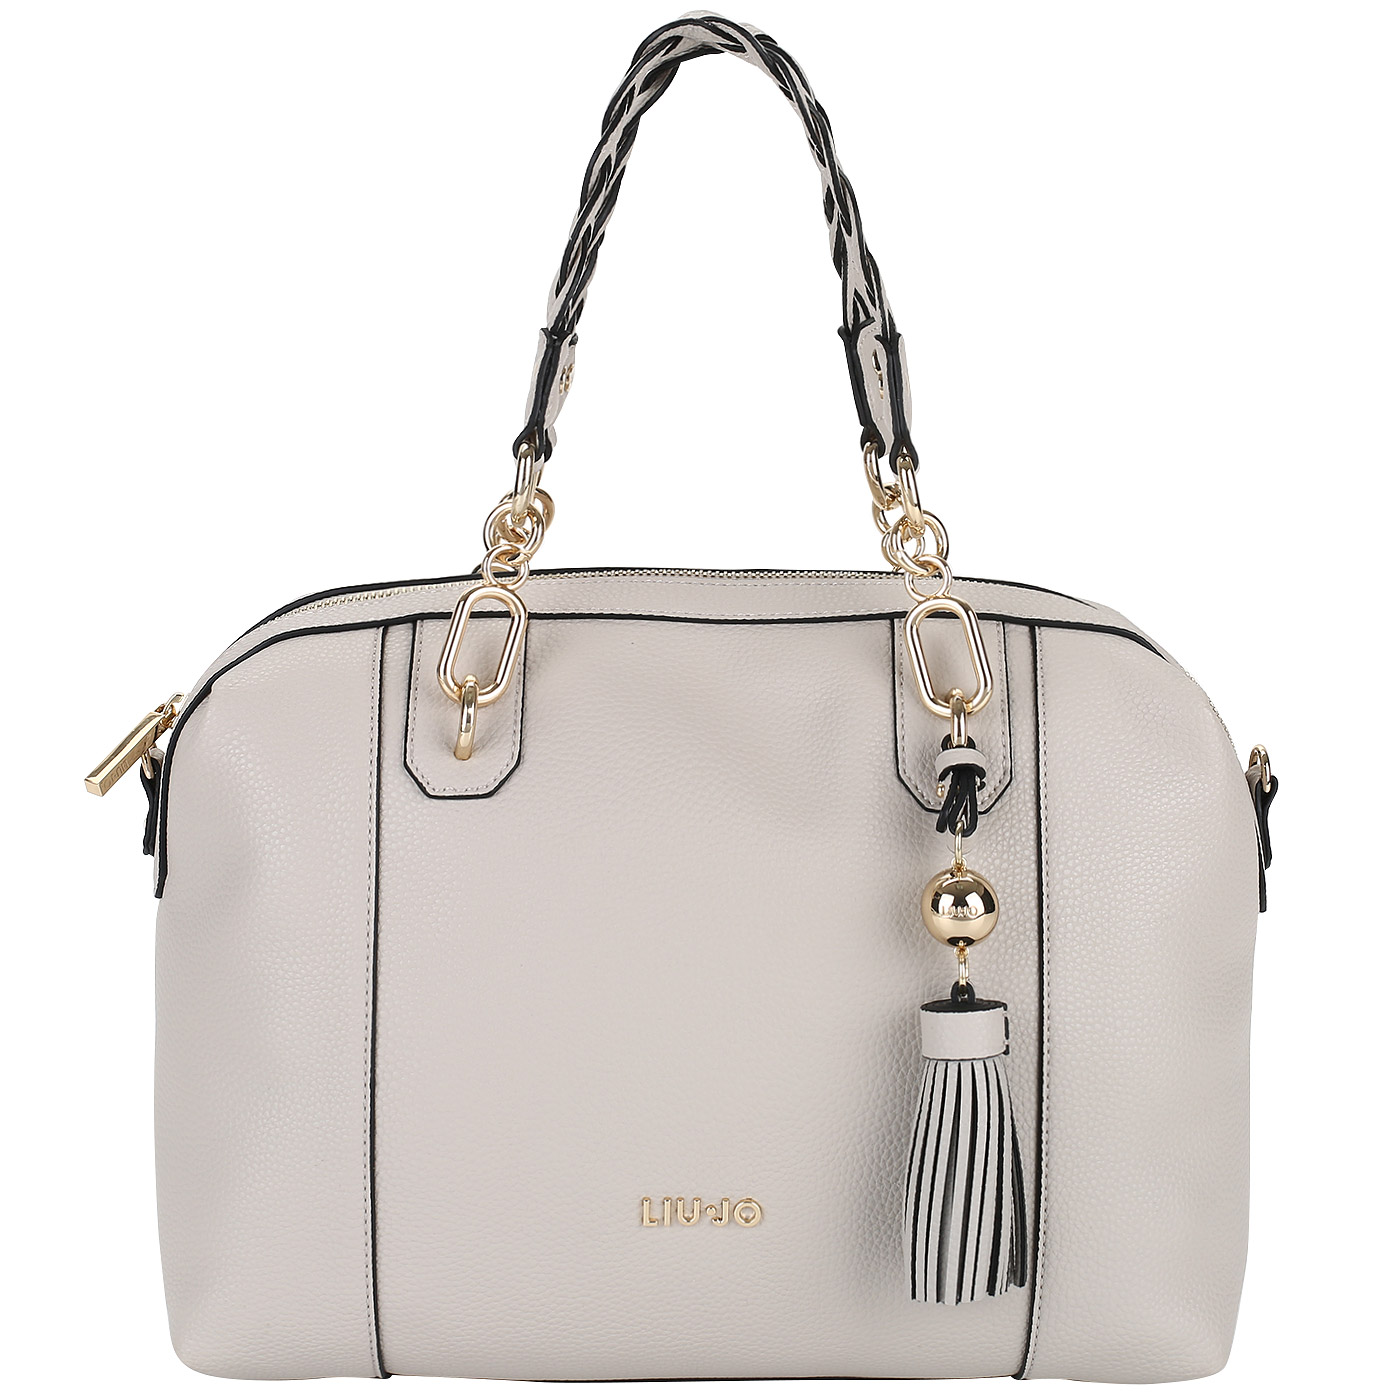 17b0178dc1bd Женская сумка с одним отделом Liu Jo Arizona A18053E0086_soia ...